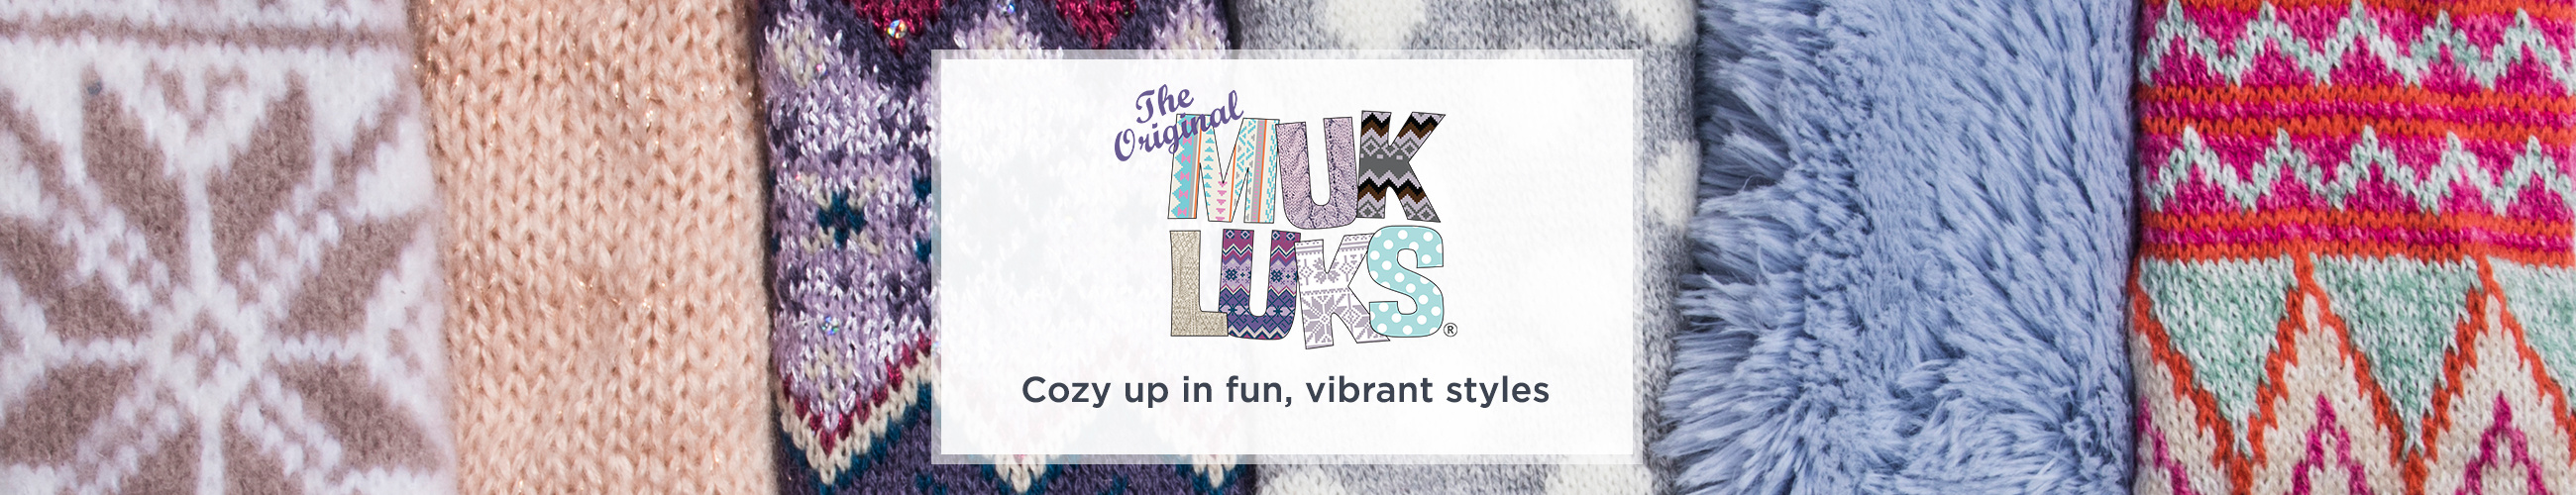 503eb30902c ... vibrant styles Muk Luks - Cozy up in fun